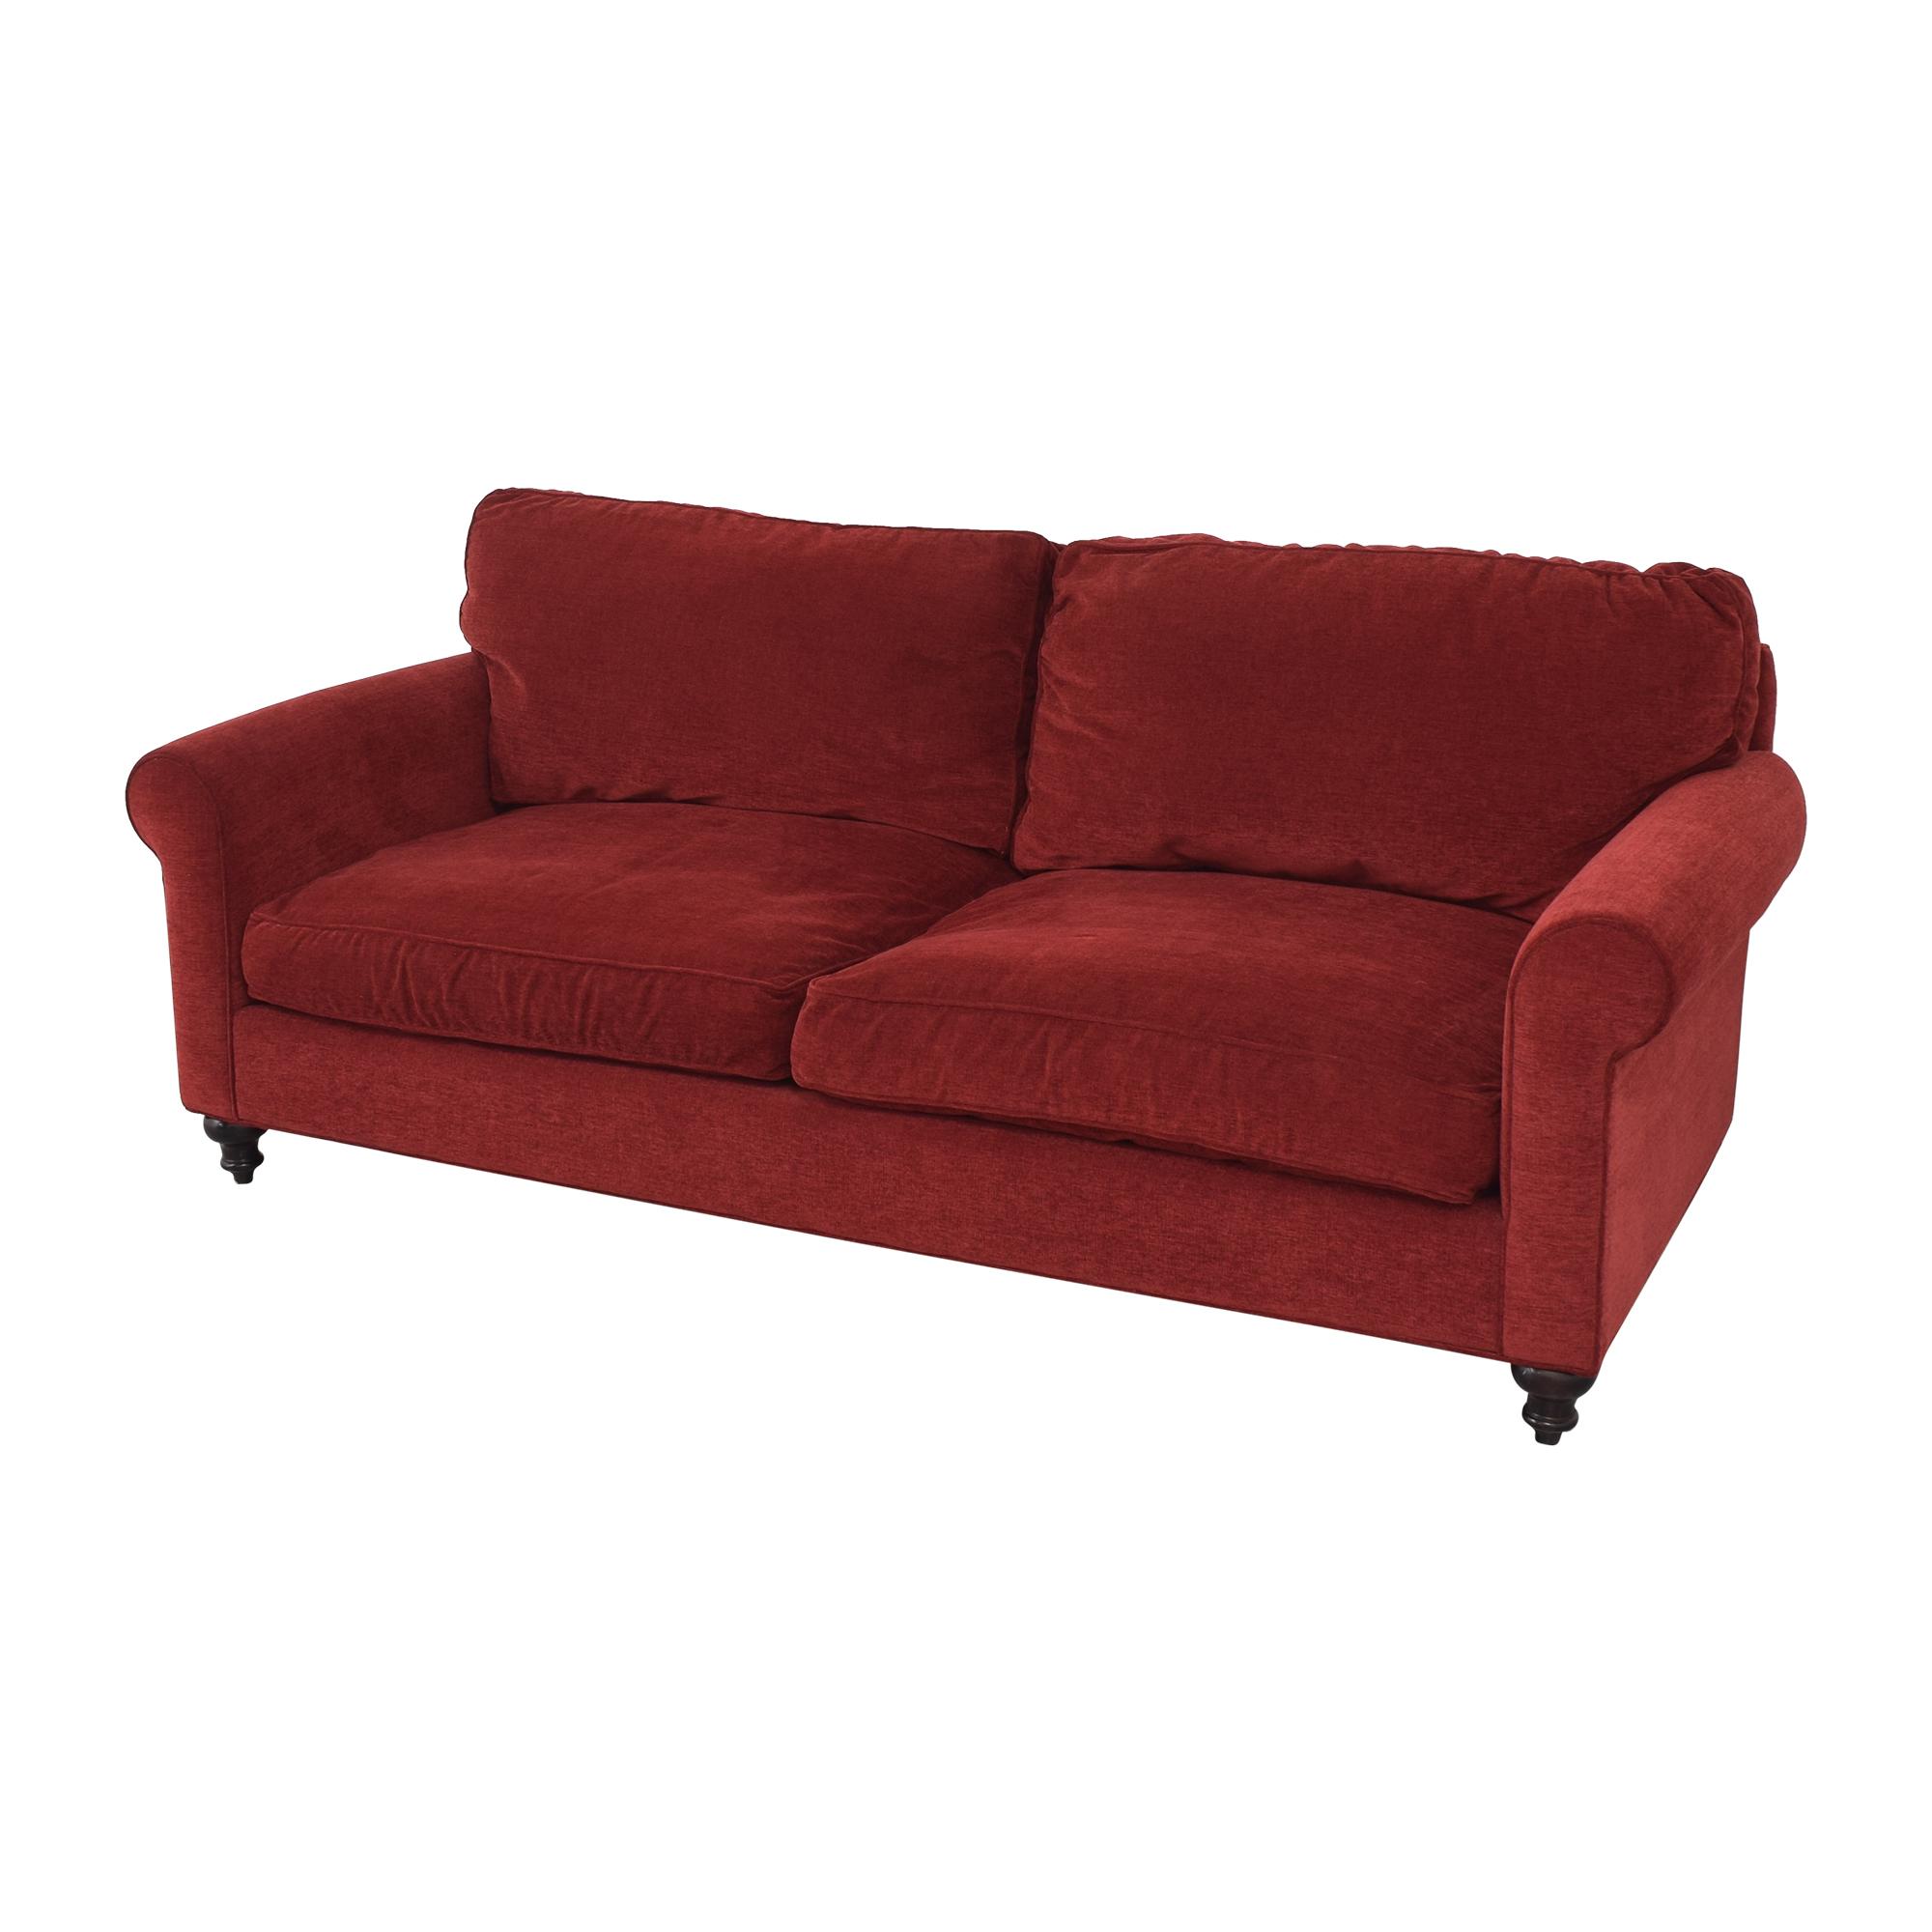 Lillian August Roll Arm Sofa / Classic Sofas